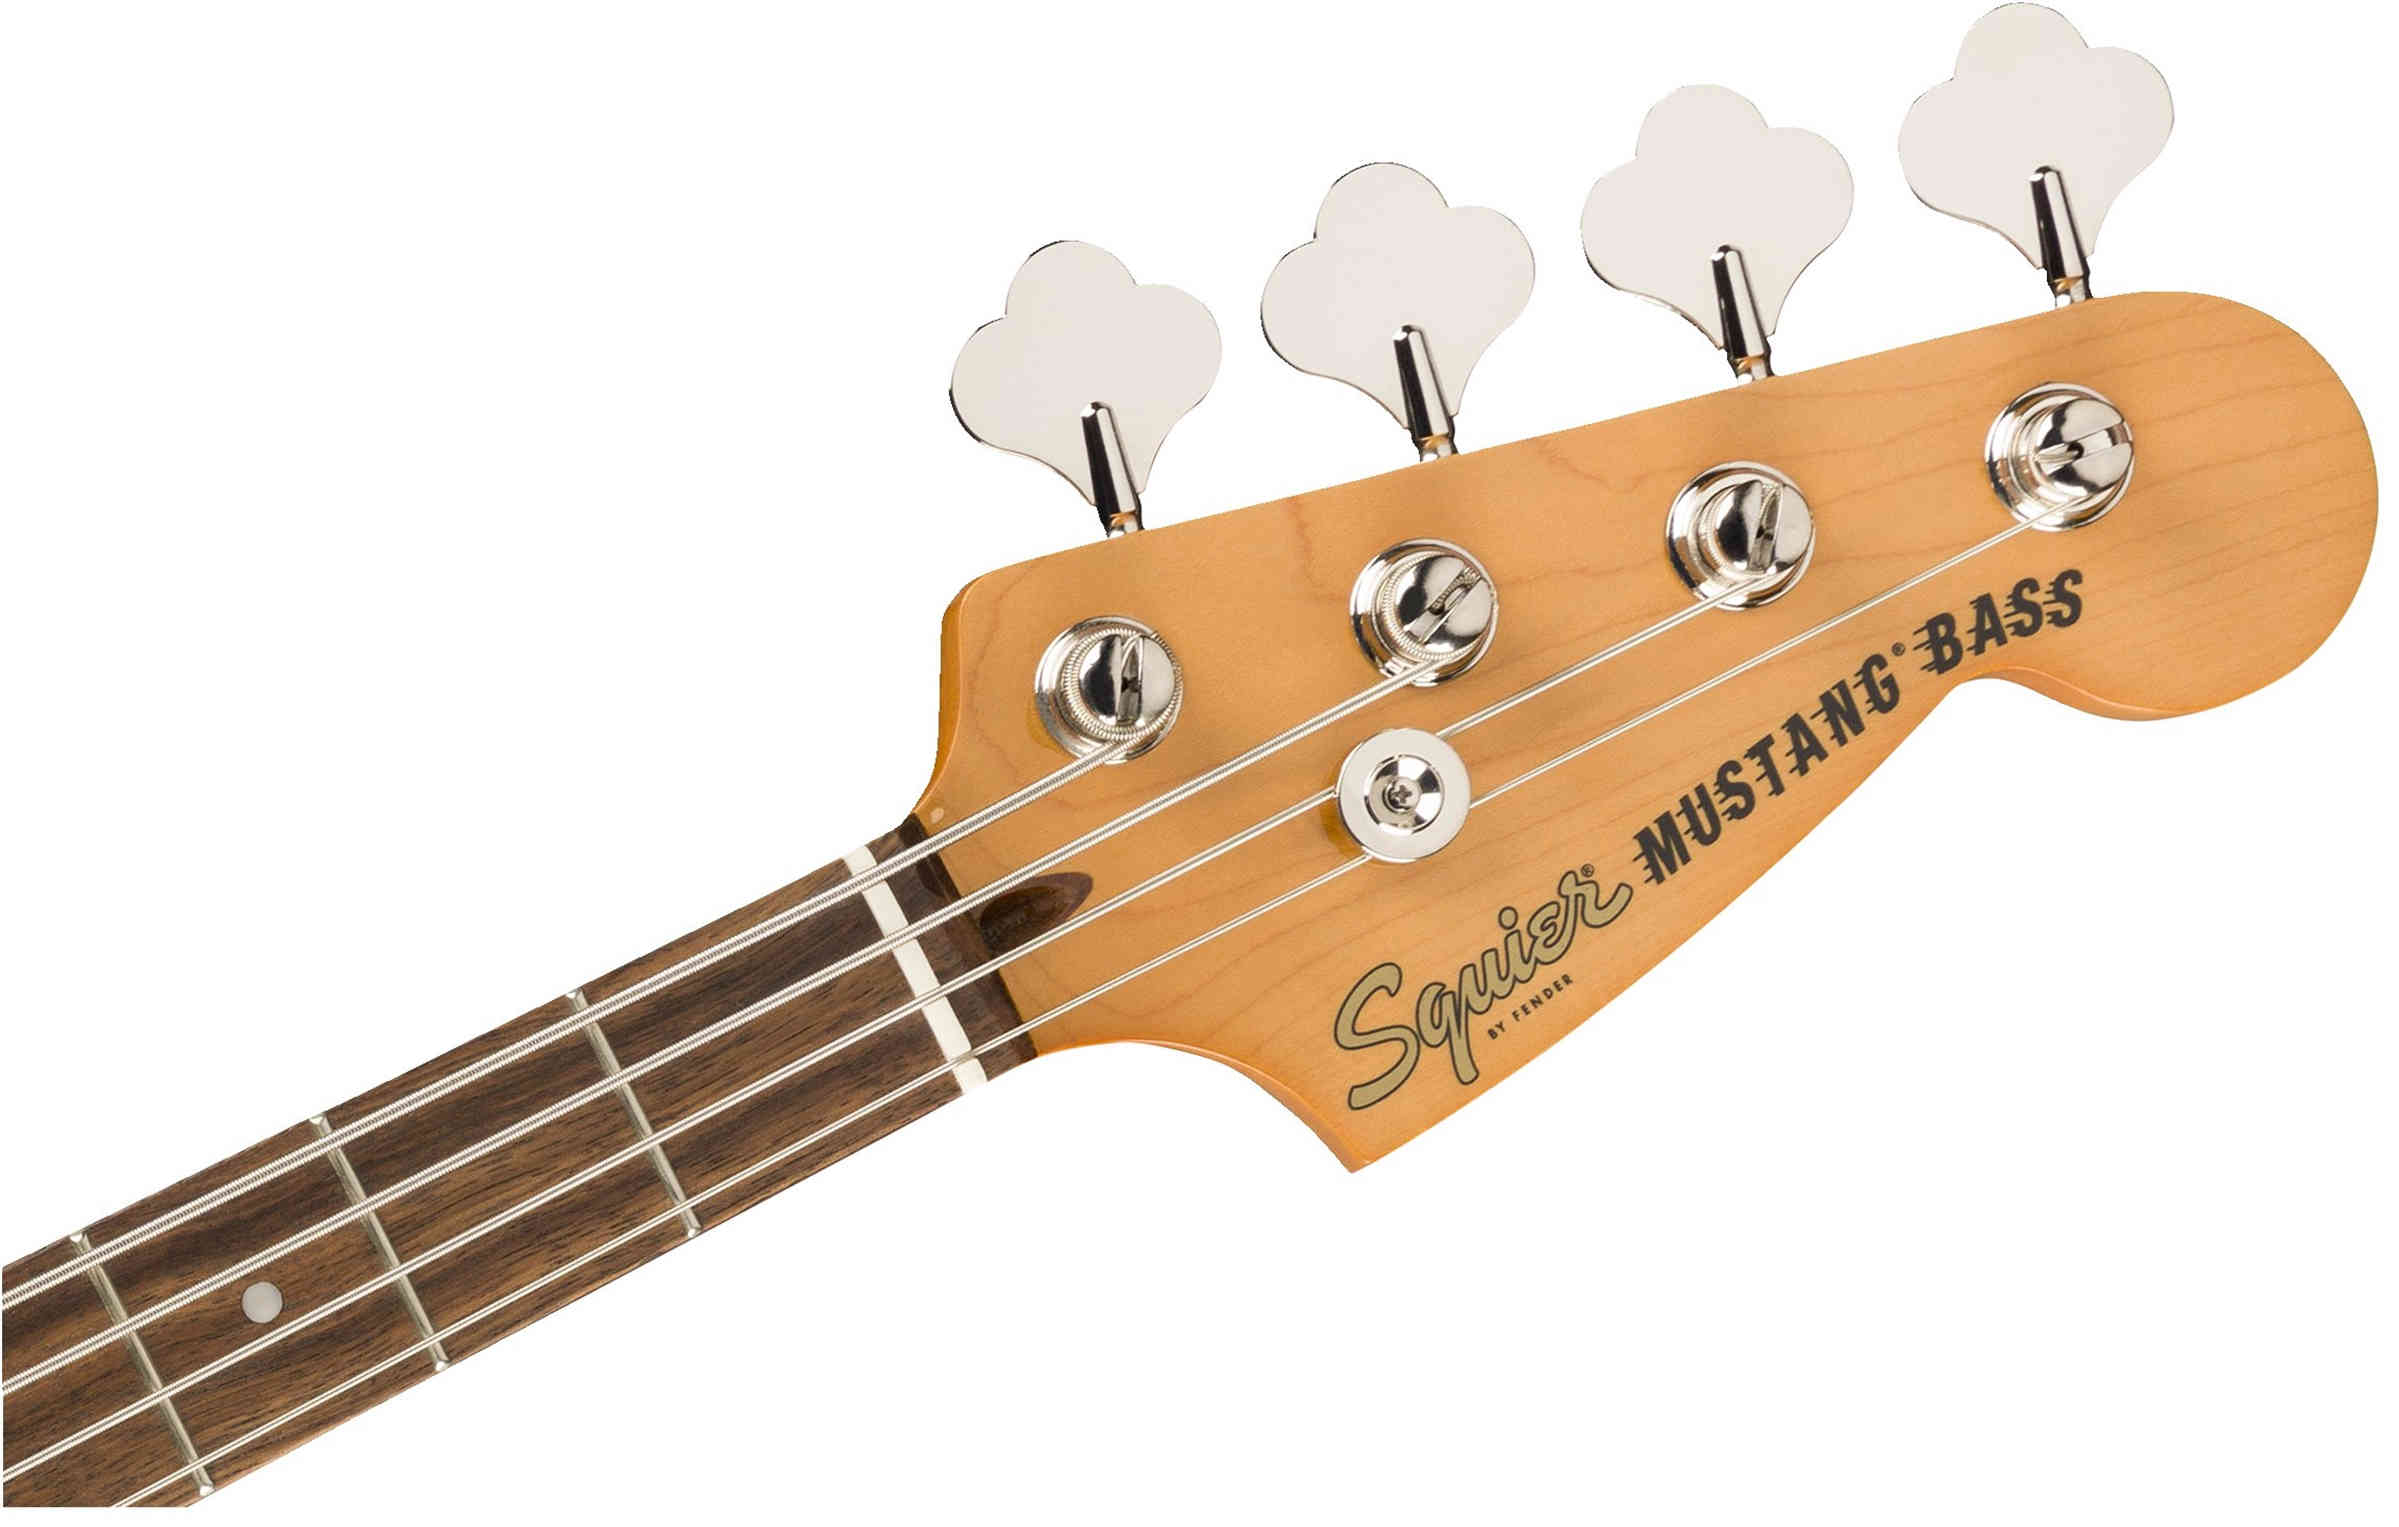 Squier Classic Vibe '60s Mustang® Bass, Indian Laurel Fingerboard, Surf Green